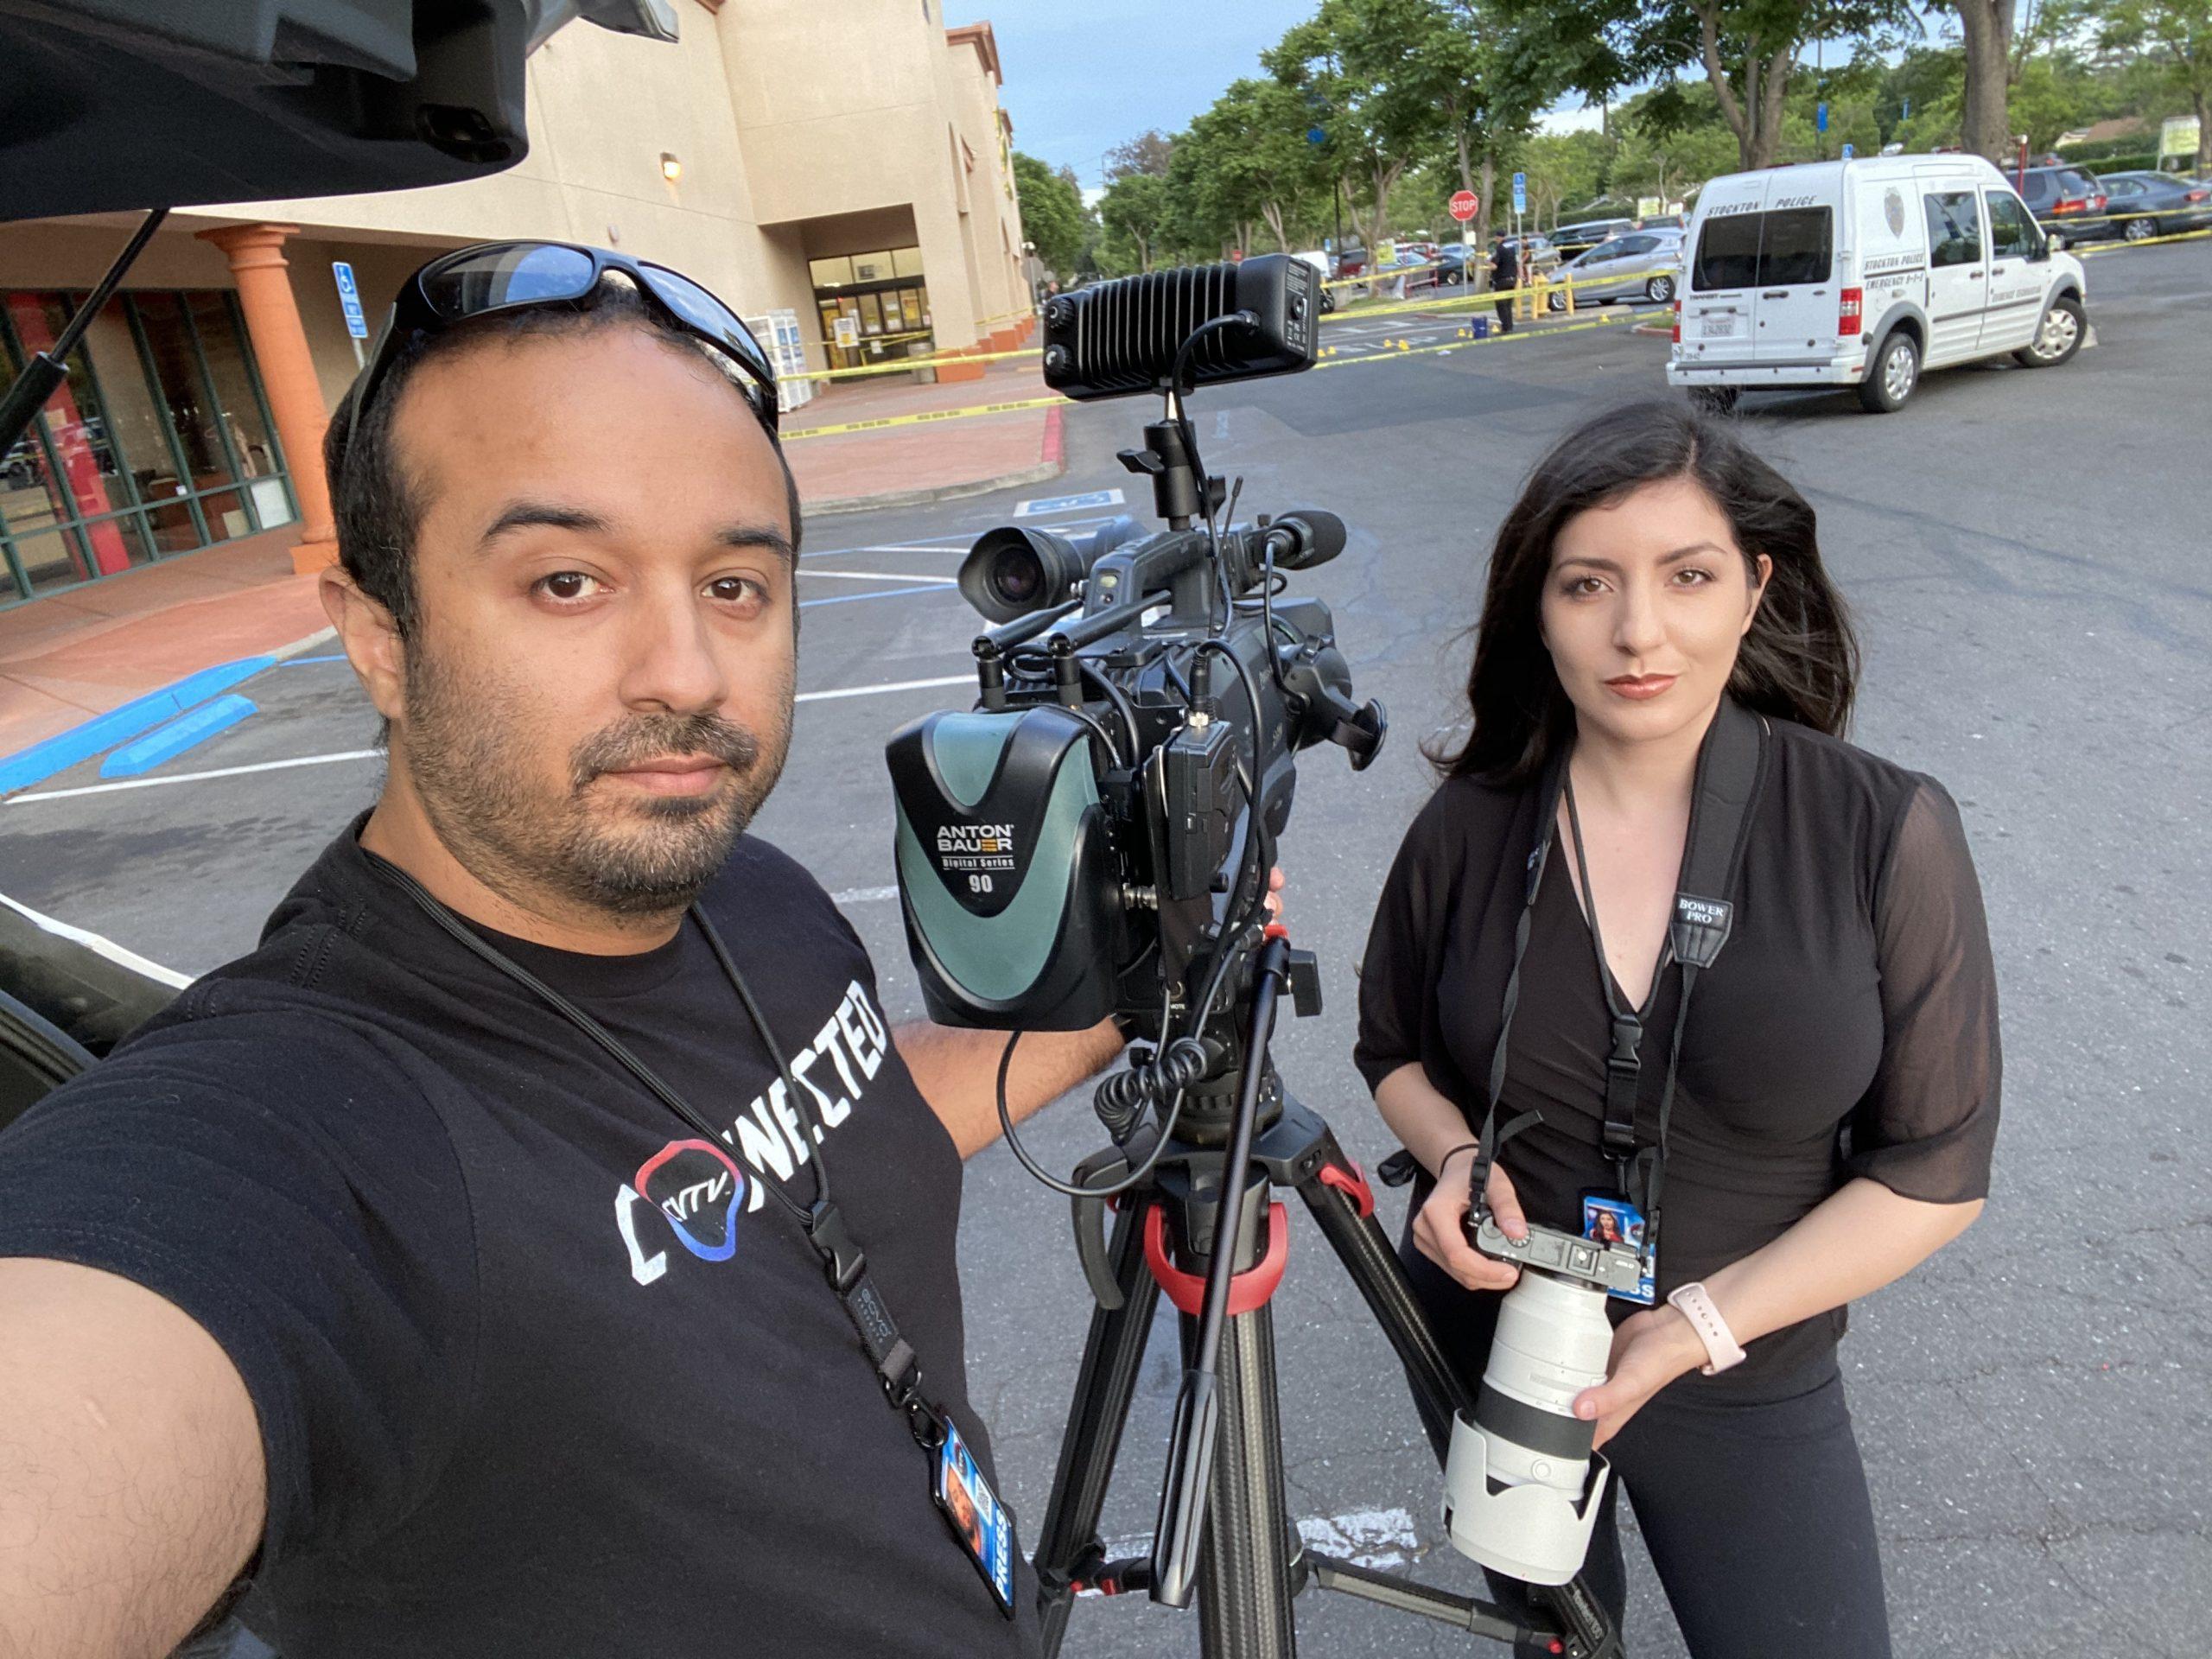 Carlos Rodriguez and his partner Gabby Muro